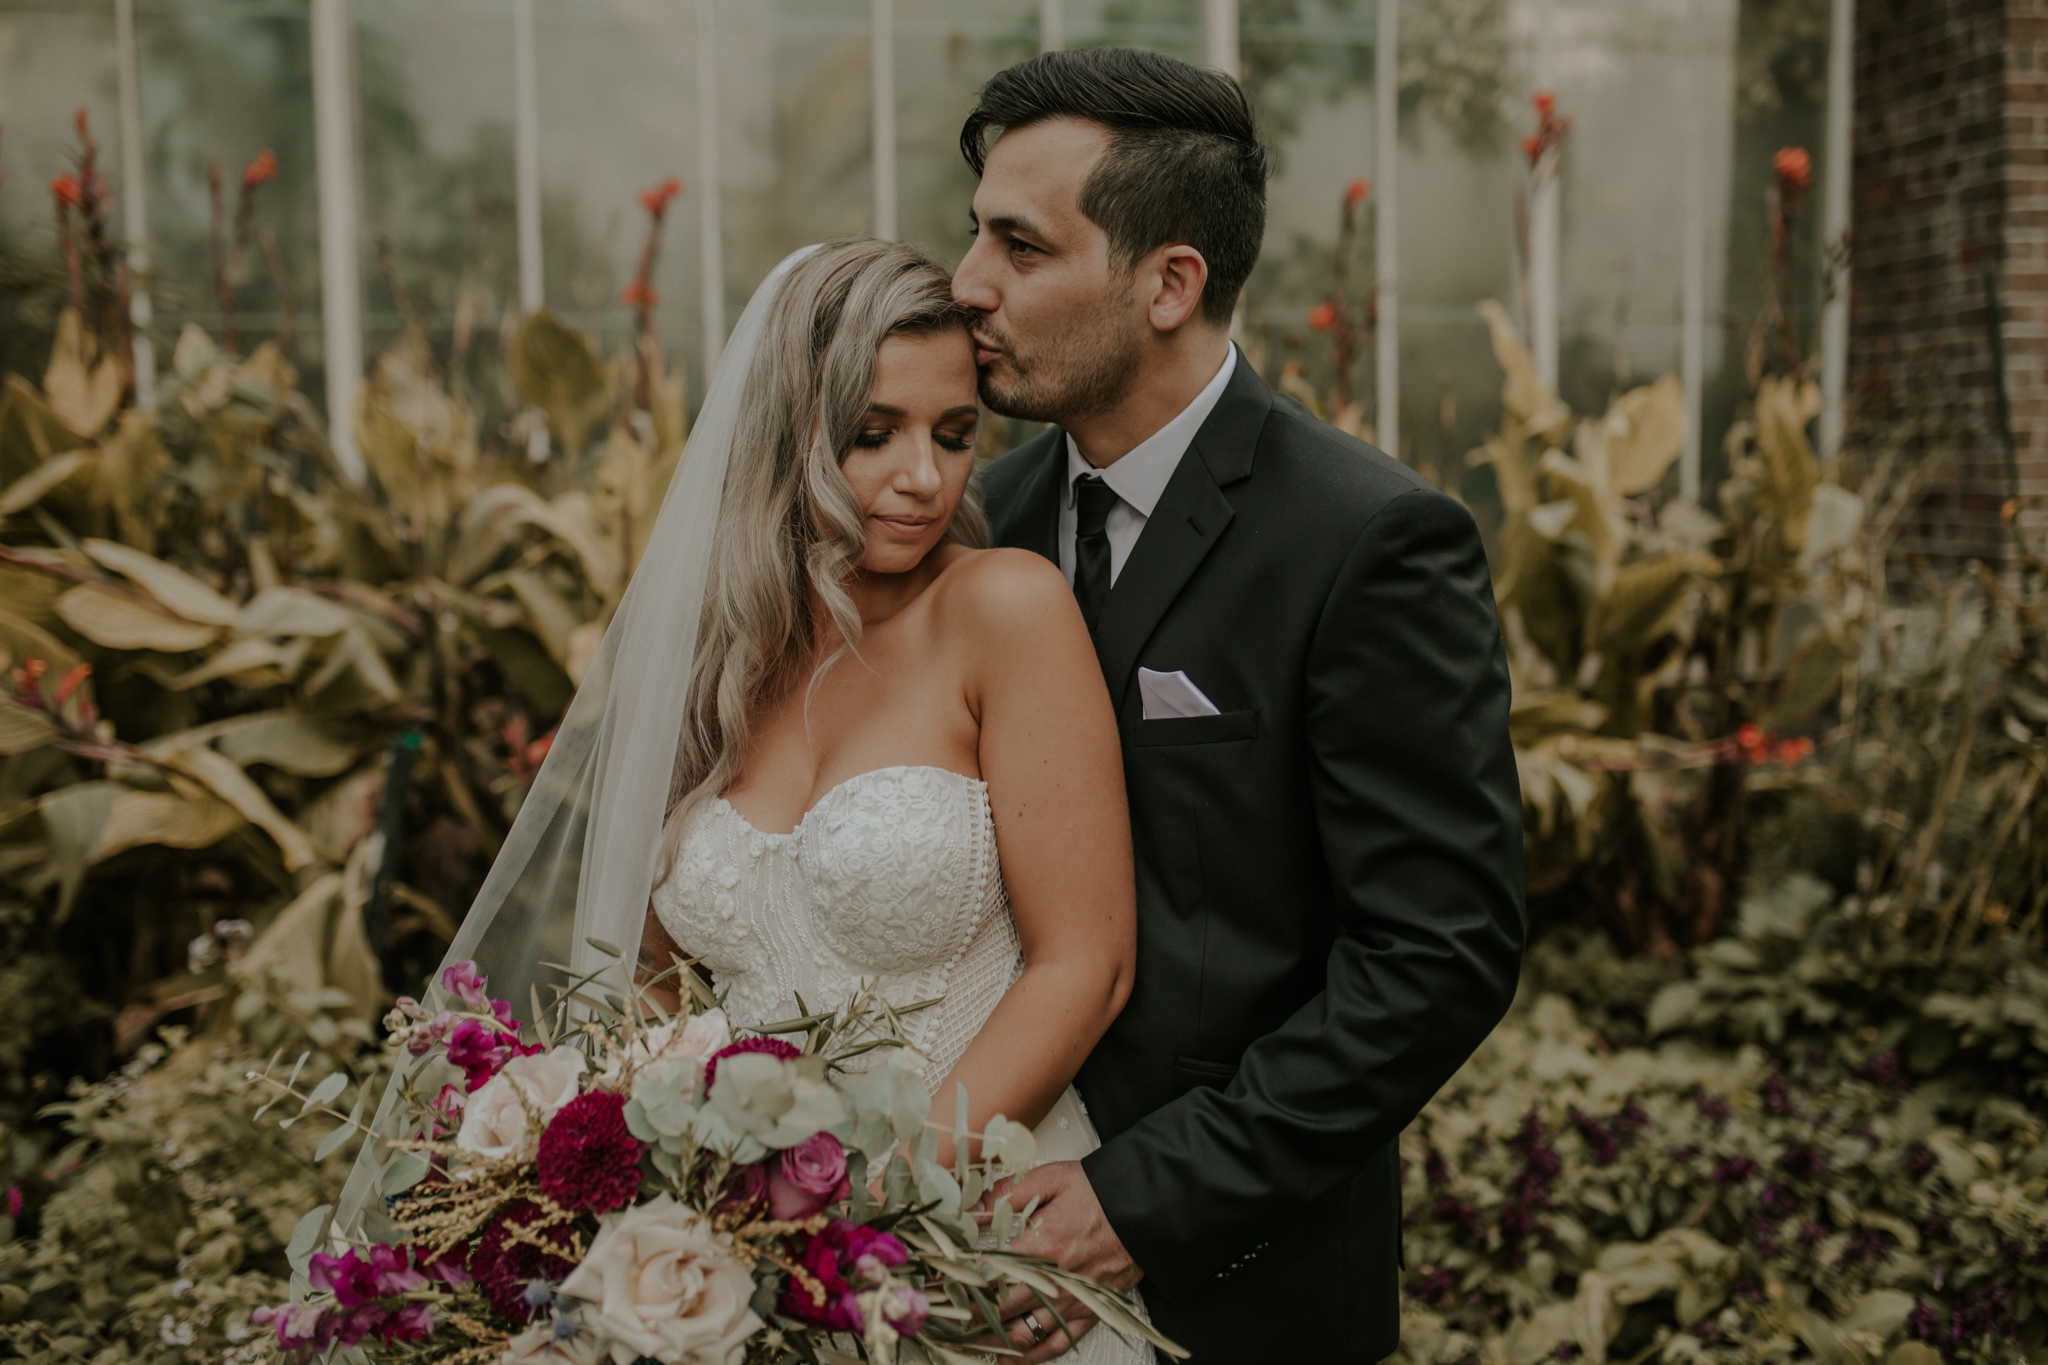 Simone and alex: Mantells Wedding